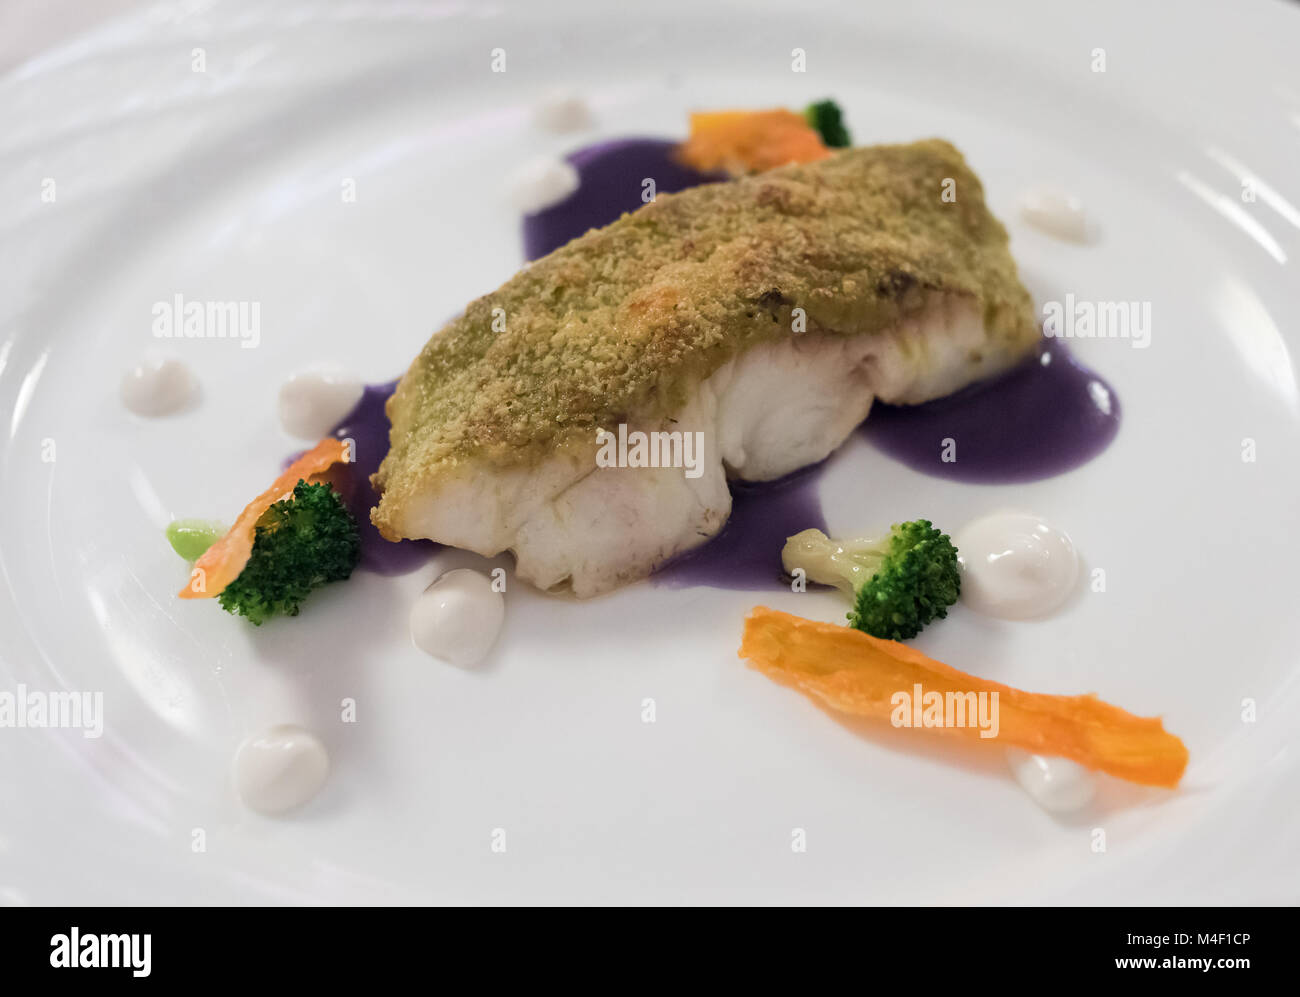 Kreative feine Restaurants weiße Fischgericht in Kräutern paniert Stockbild